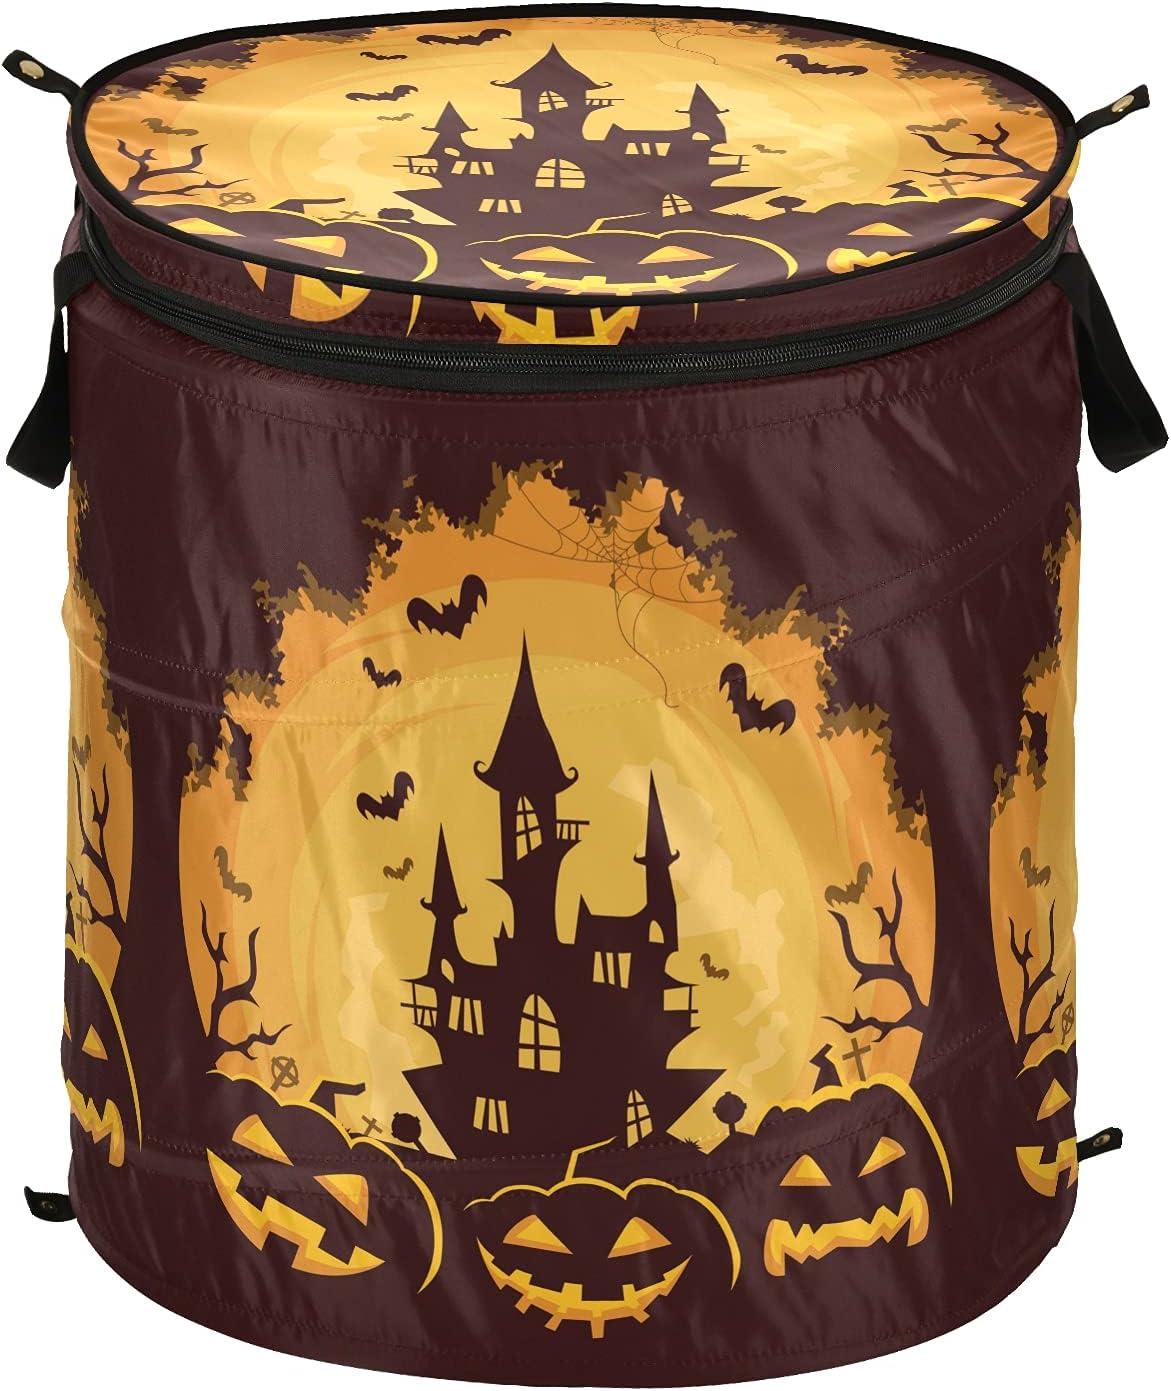 Happy Halloween Castle Pumpkin Pop Up with Cheap sale Classic Fo Lid Laundry Hamper